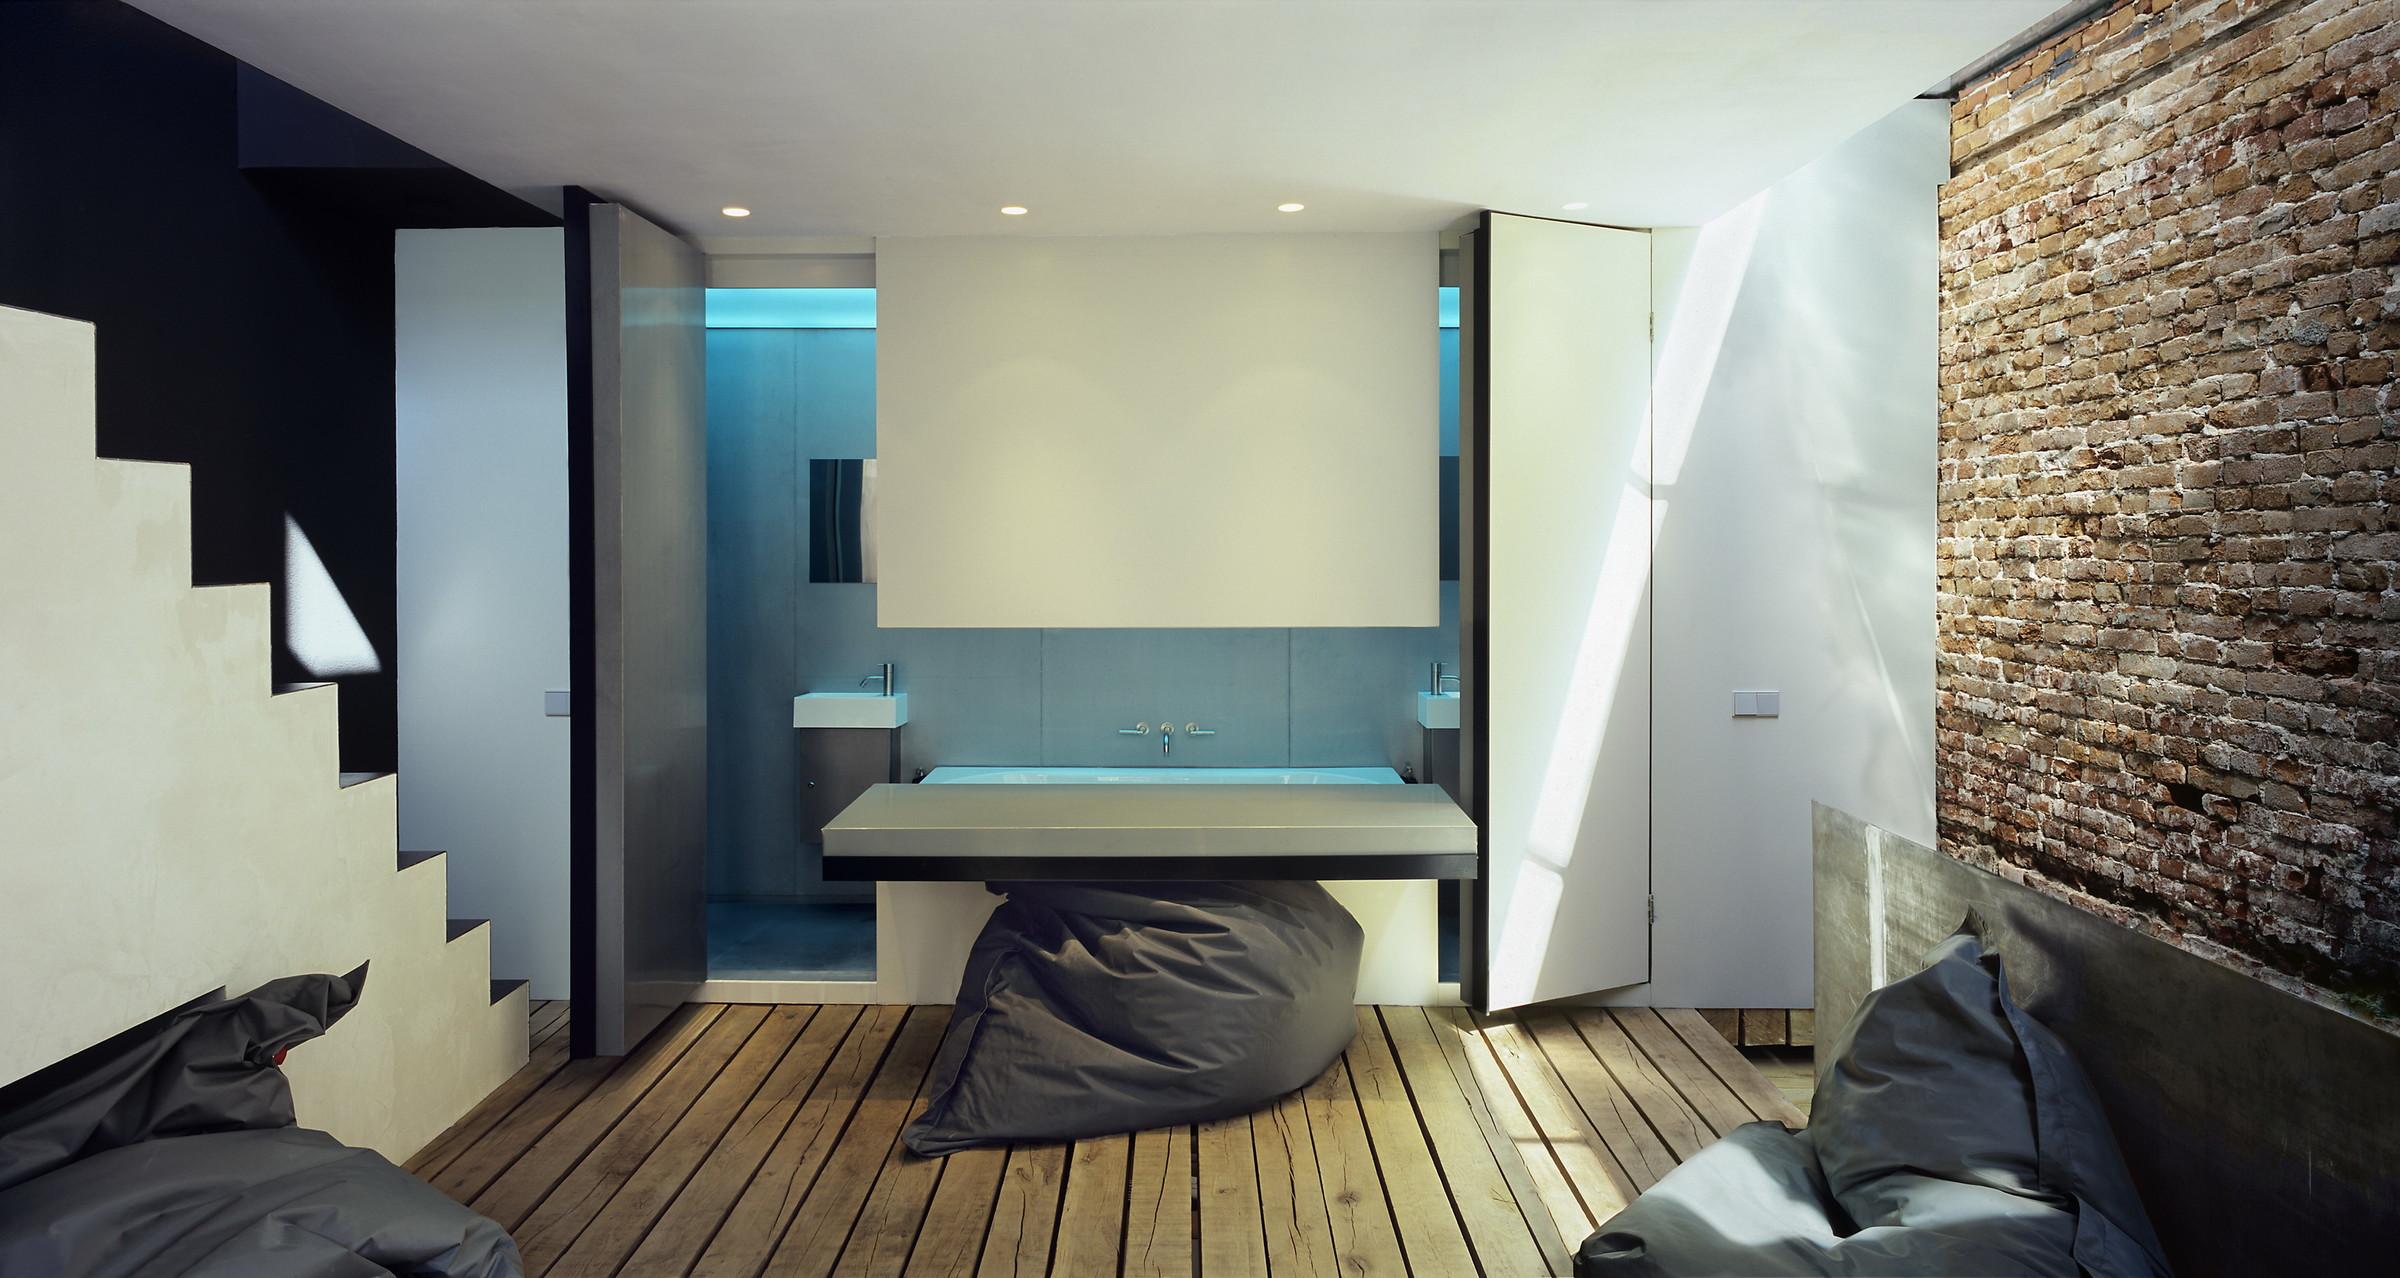 Woonlaboratorium utrecht zecc architecten for Come costruire un capannone moderno